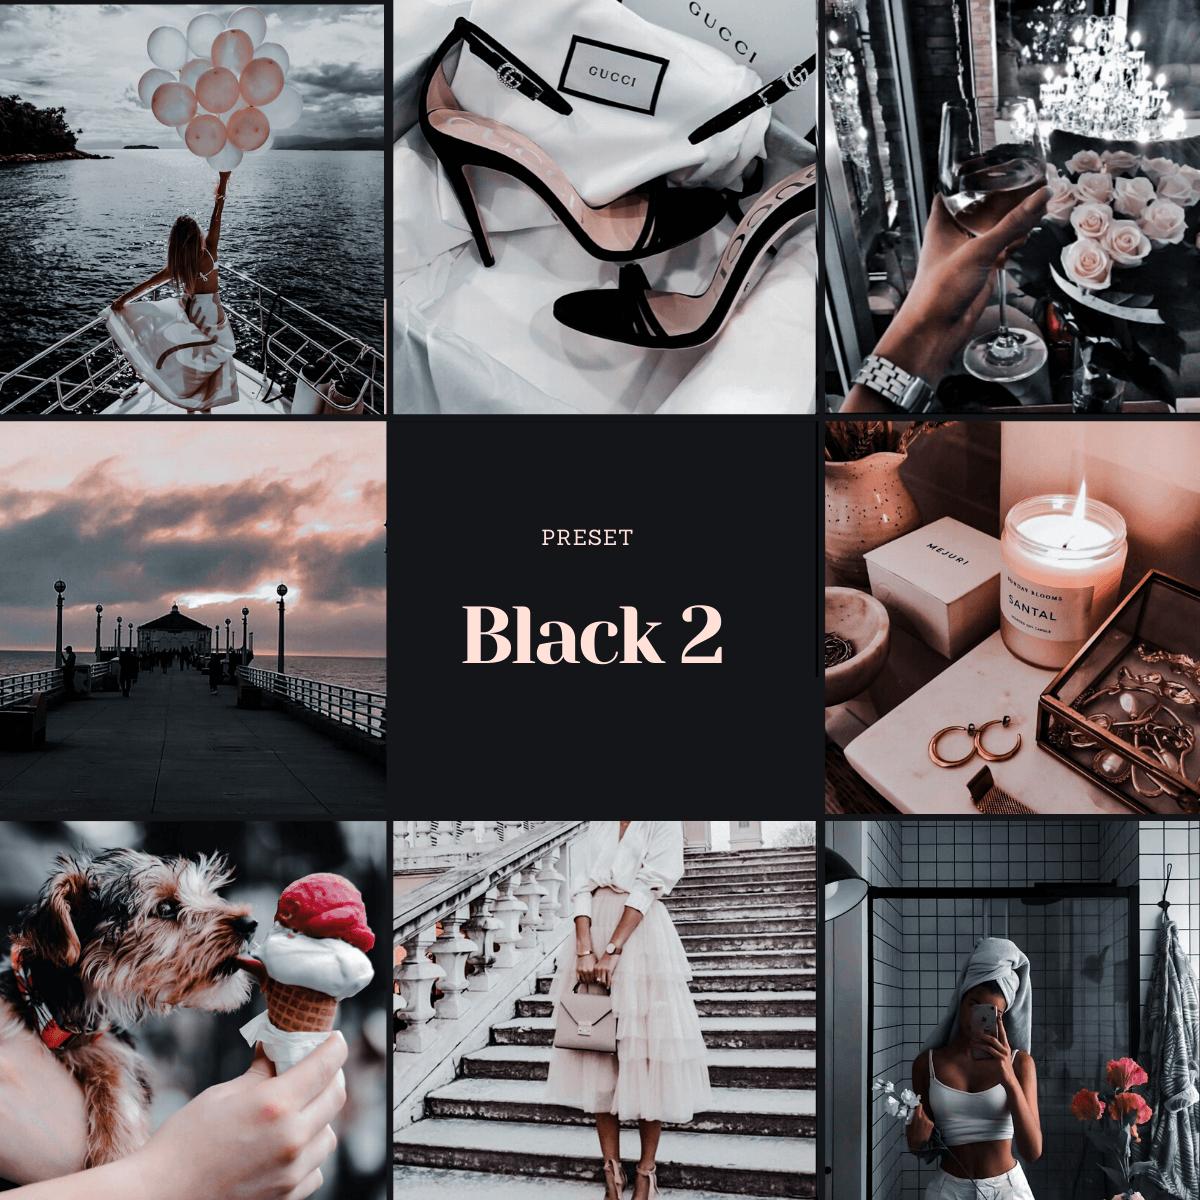 black-2-a